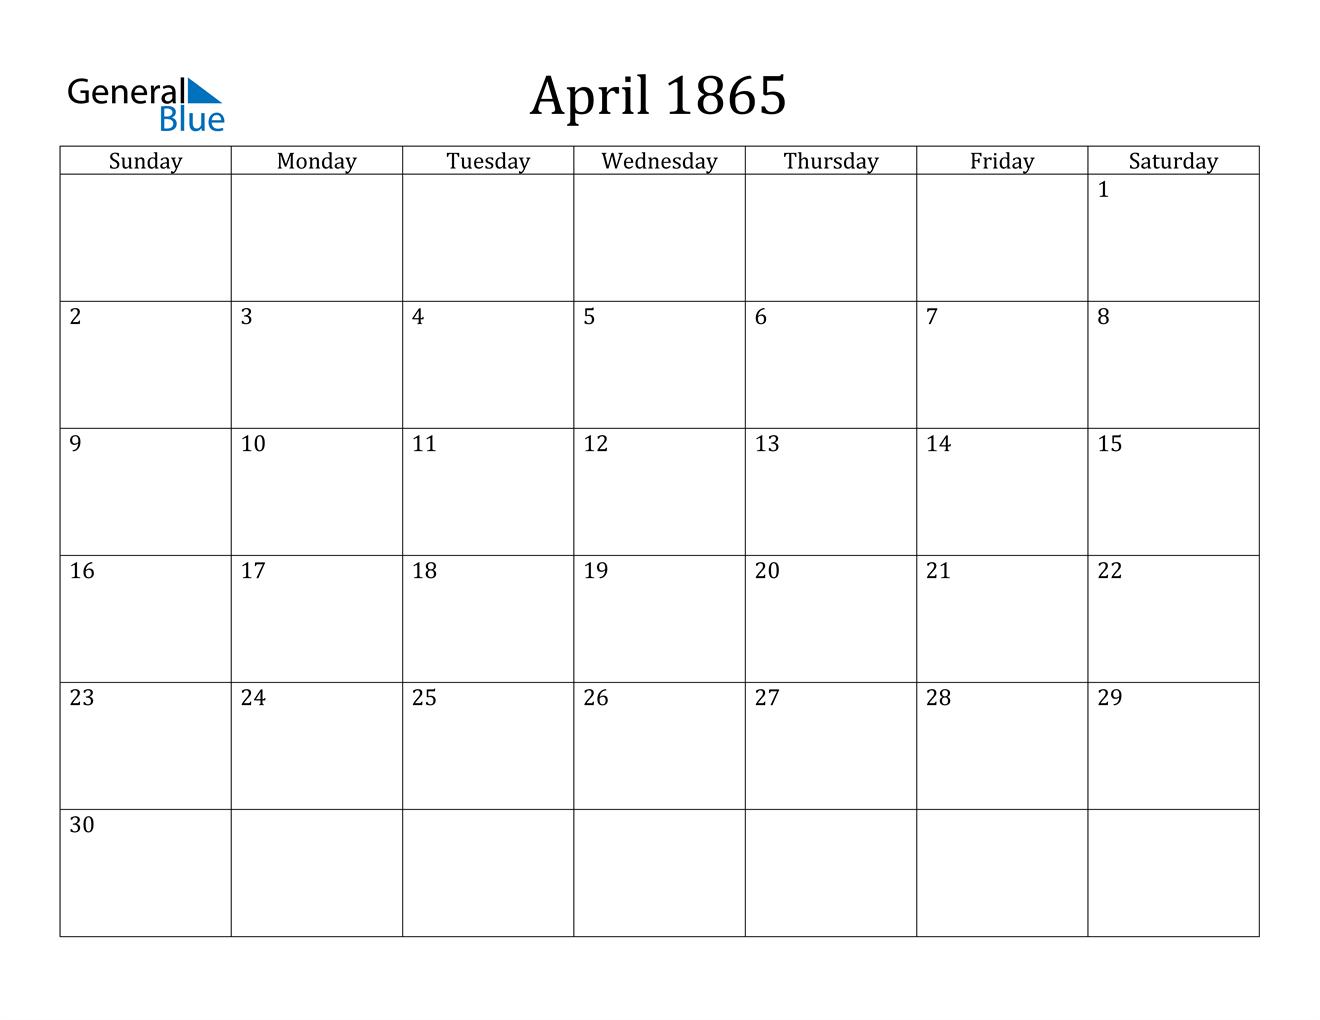 Image of April 1865 Calendar